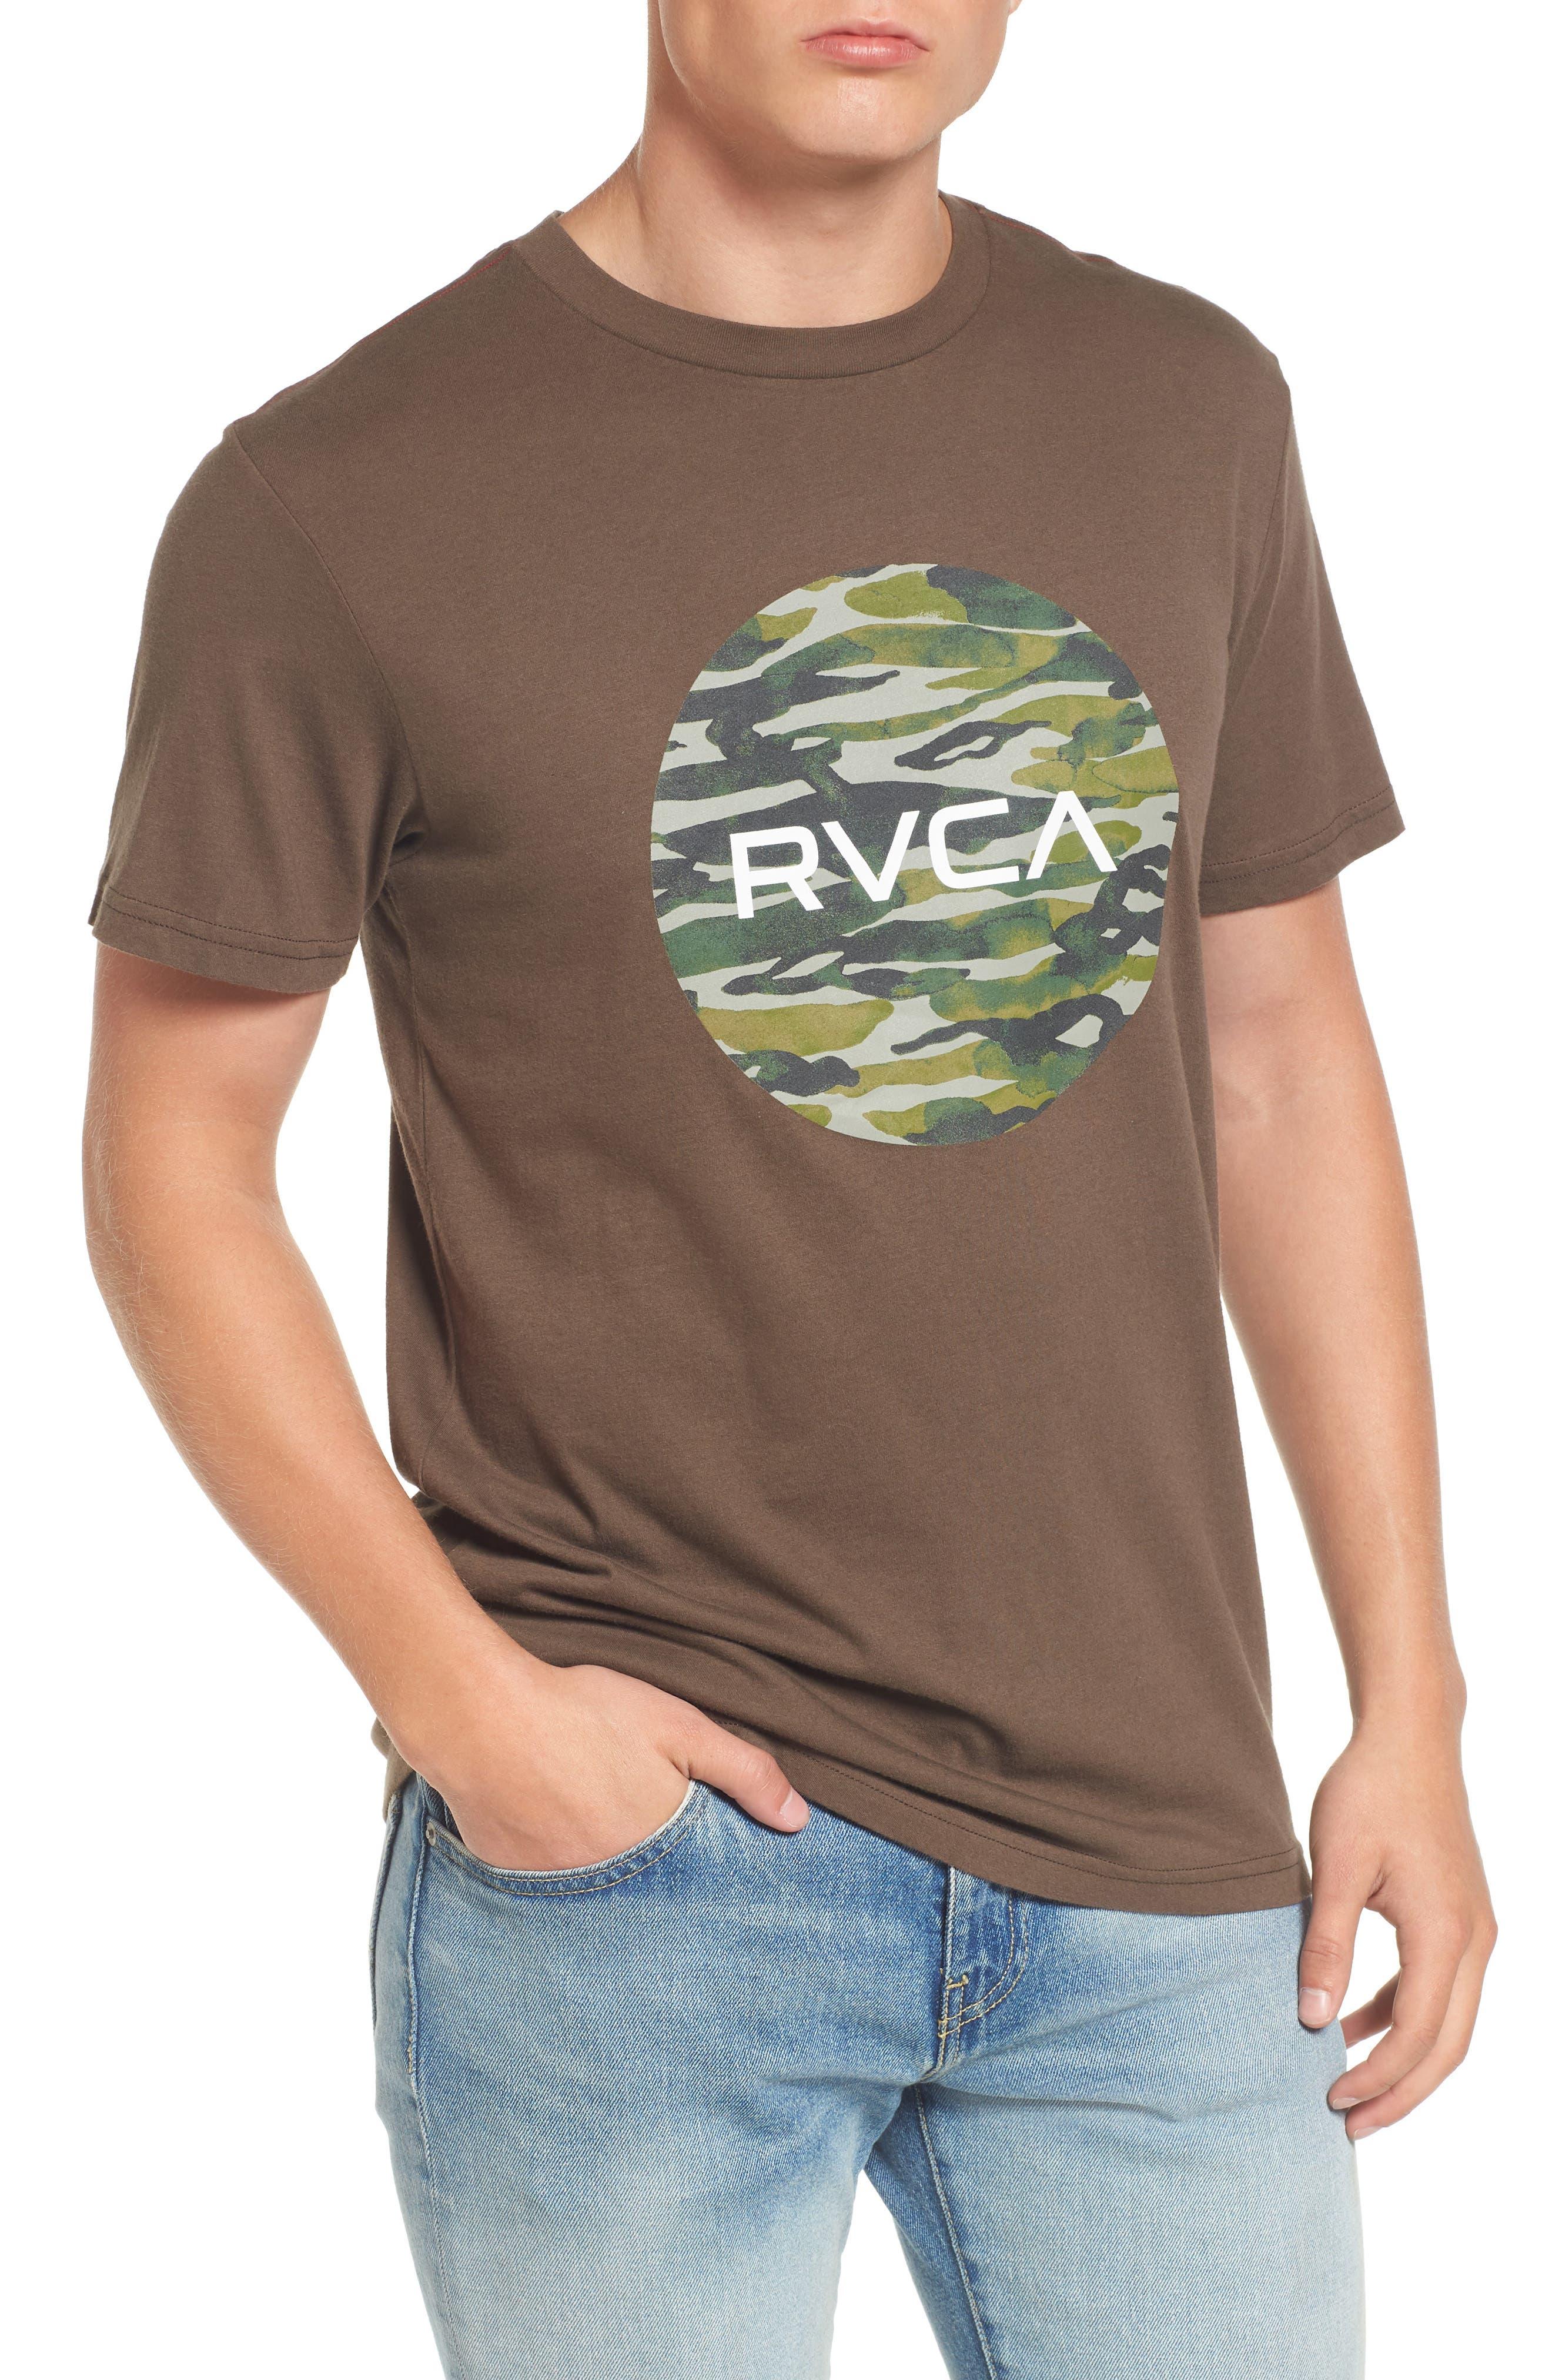 Main Image - RVCA Water Camo Motors Graphic T-Shirt